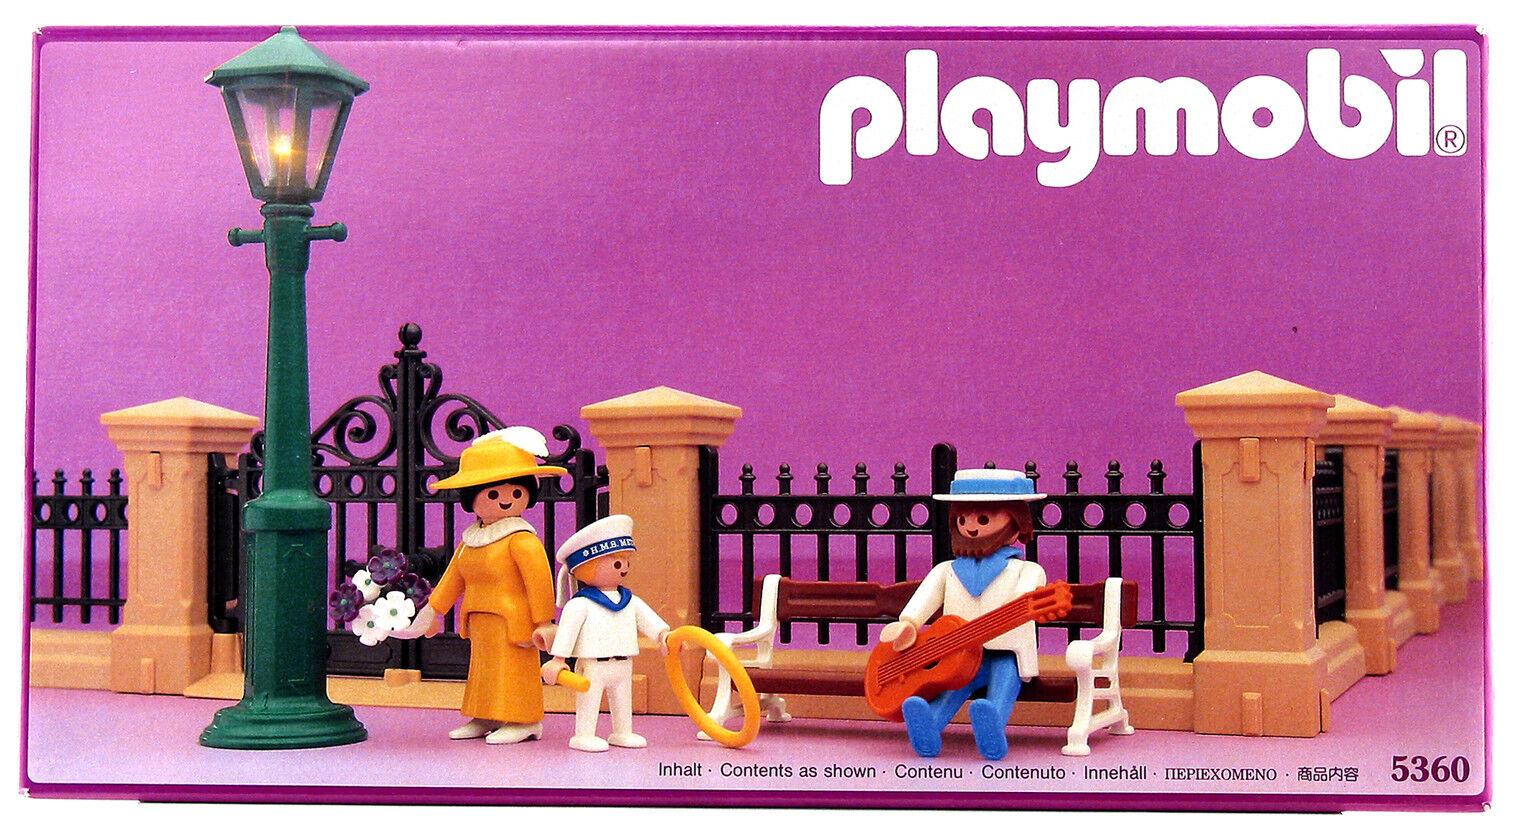 Playmobil 5360 Vintage Victorian Dollhouse Fencing - MISB RARE MINT CONDITION